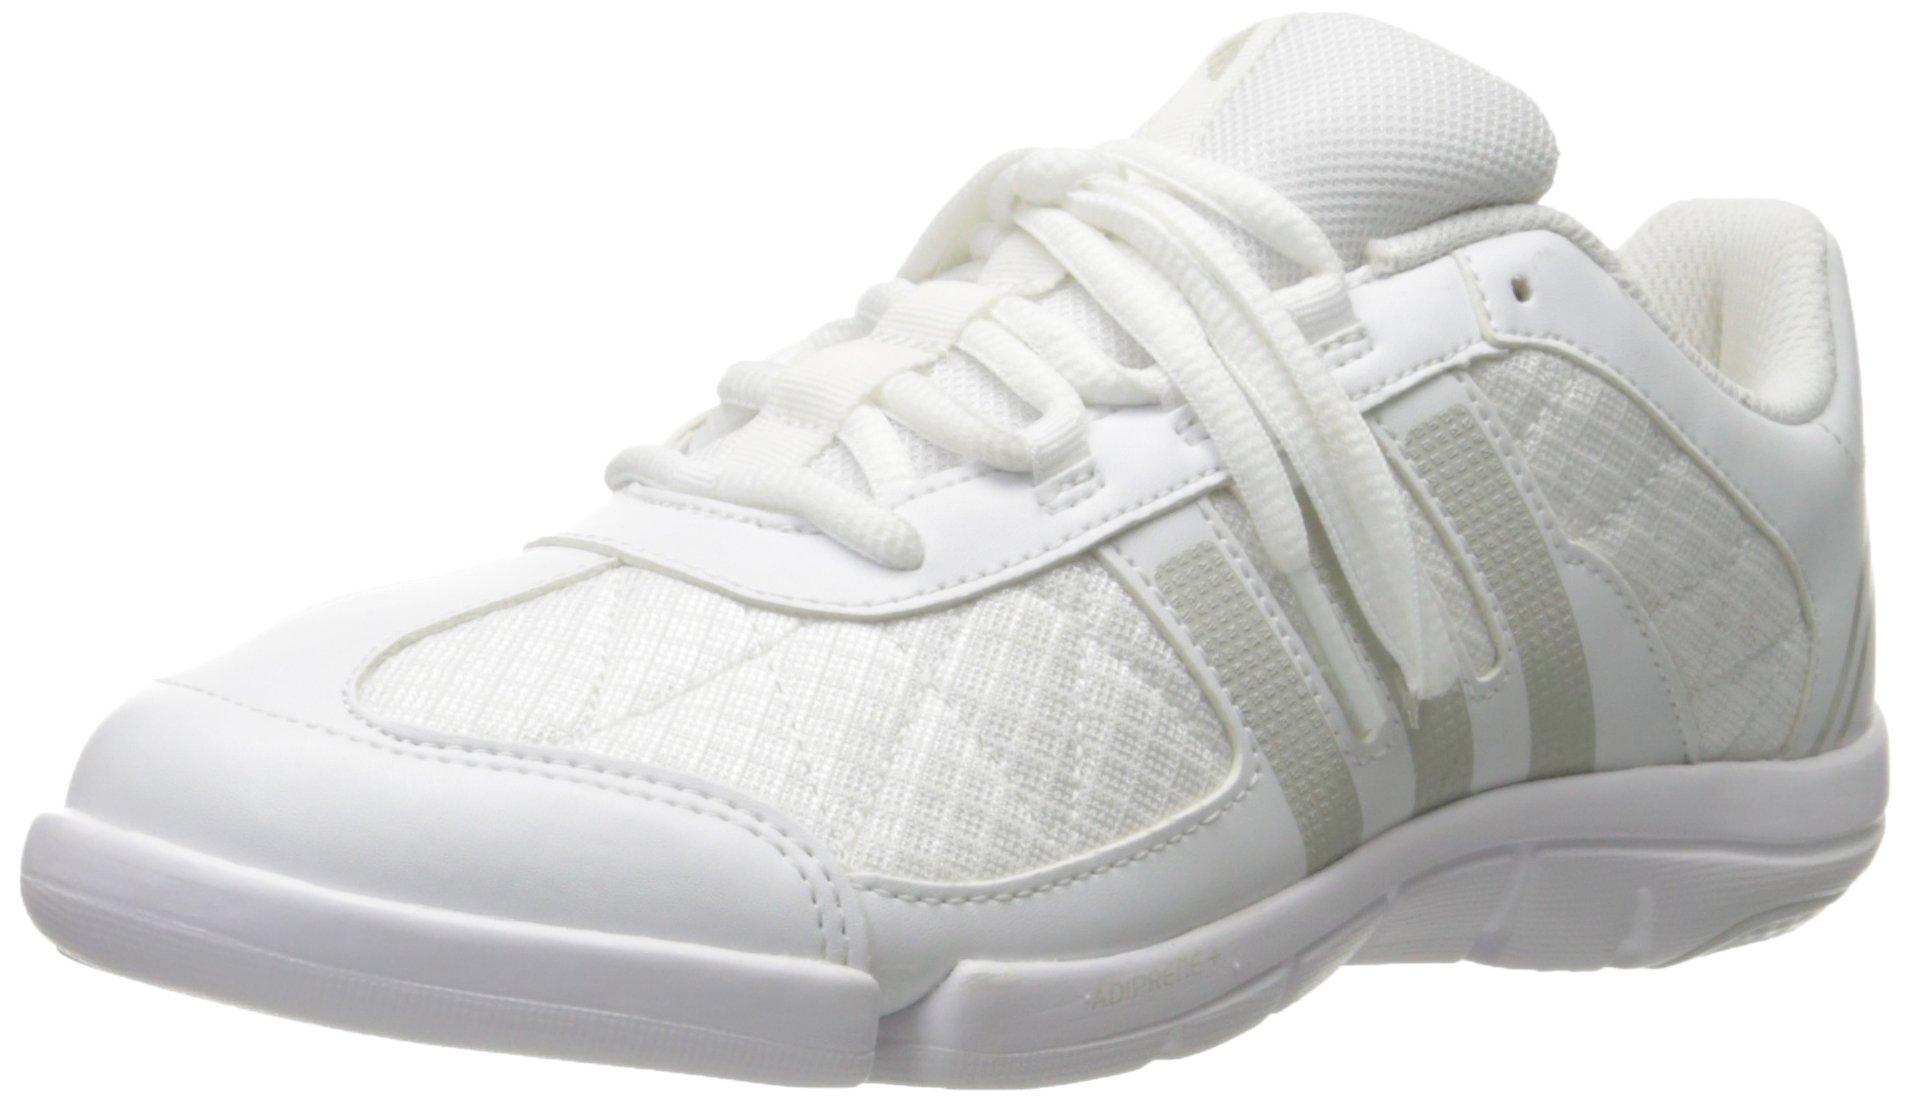 adidas Women's | Triple Cheer Cross-Trainer Shoes, White/Sharp Light Grey, ((8 M US) by adidas